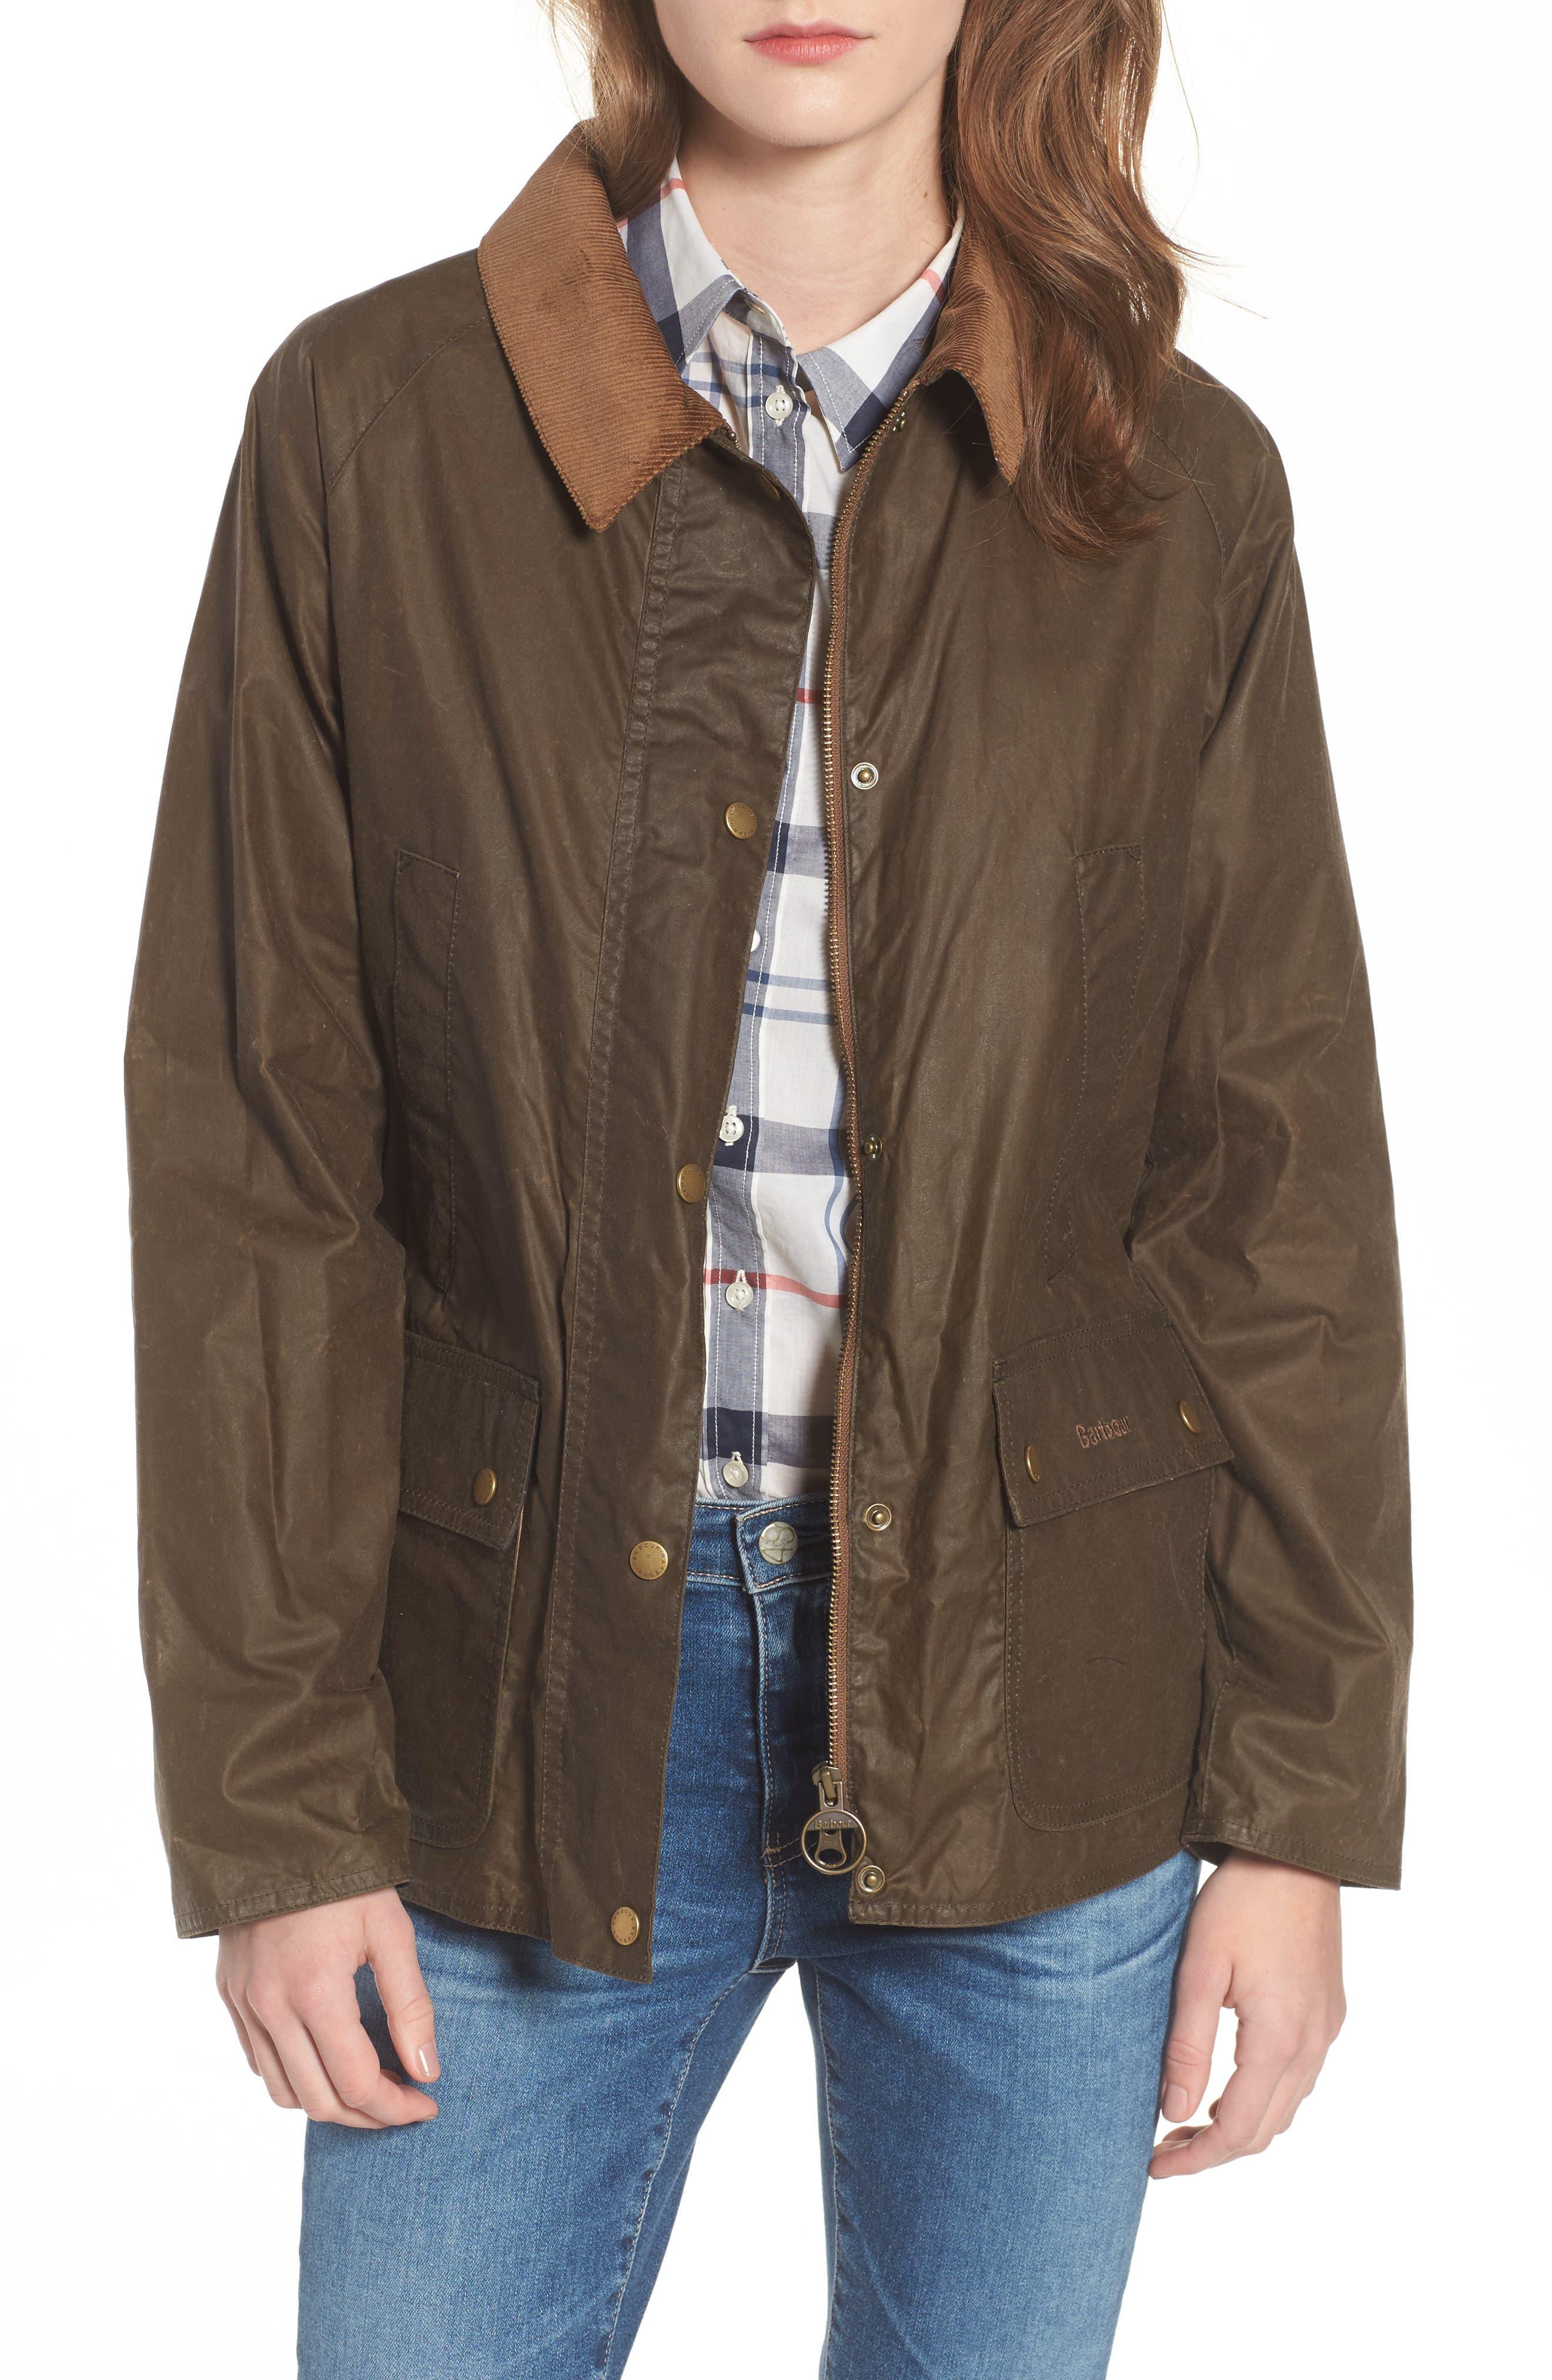 Acorn Water Resistant Waxed Cotton Jacket,                             Main thumbnail 1, color,                             230